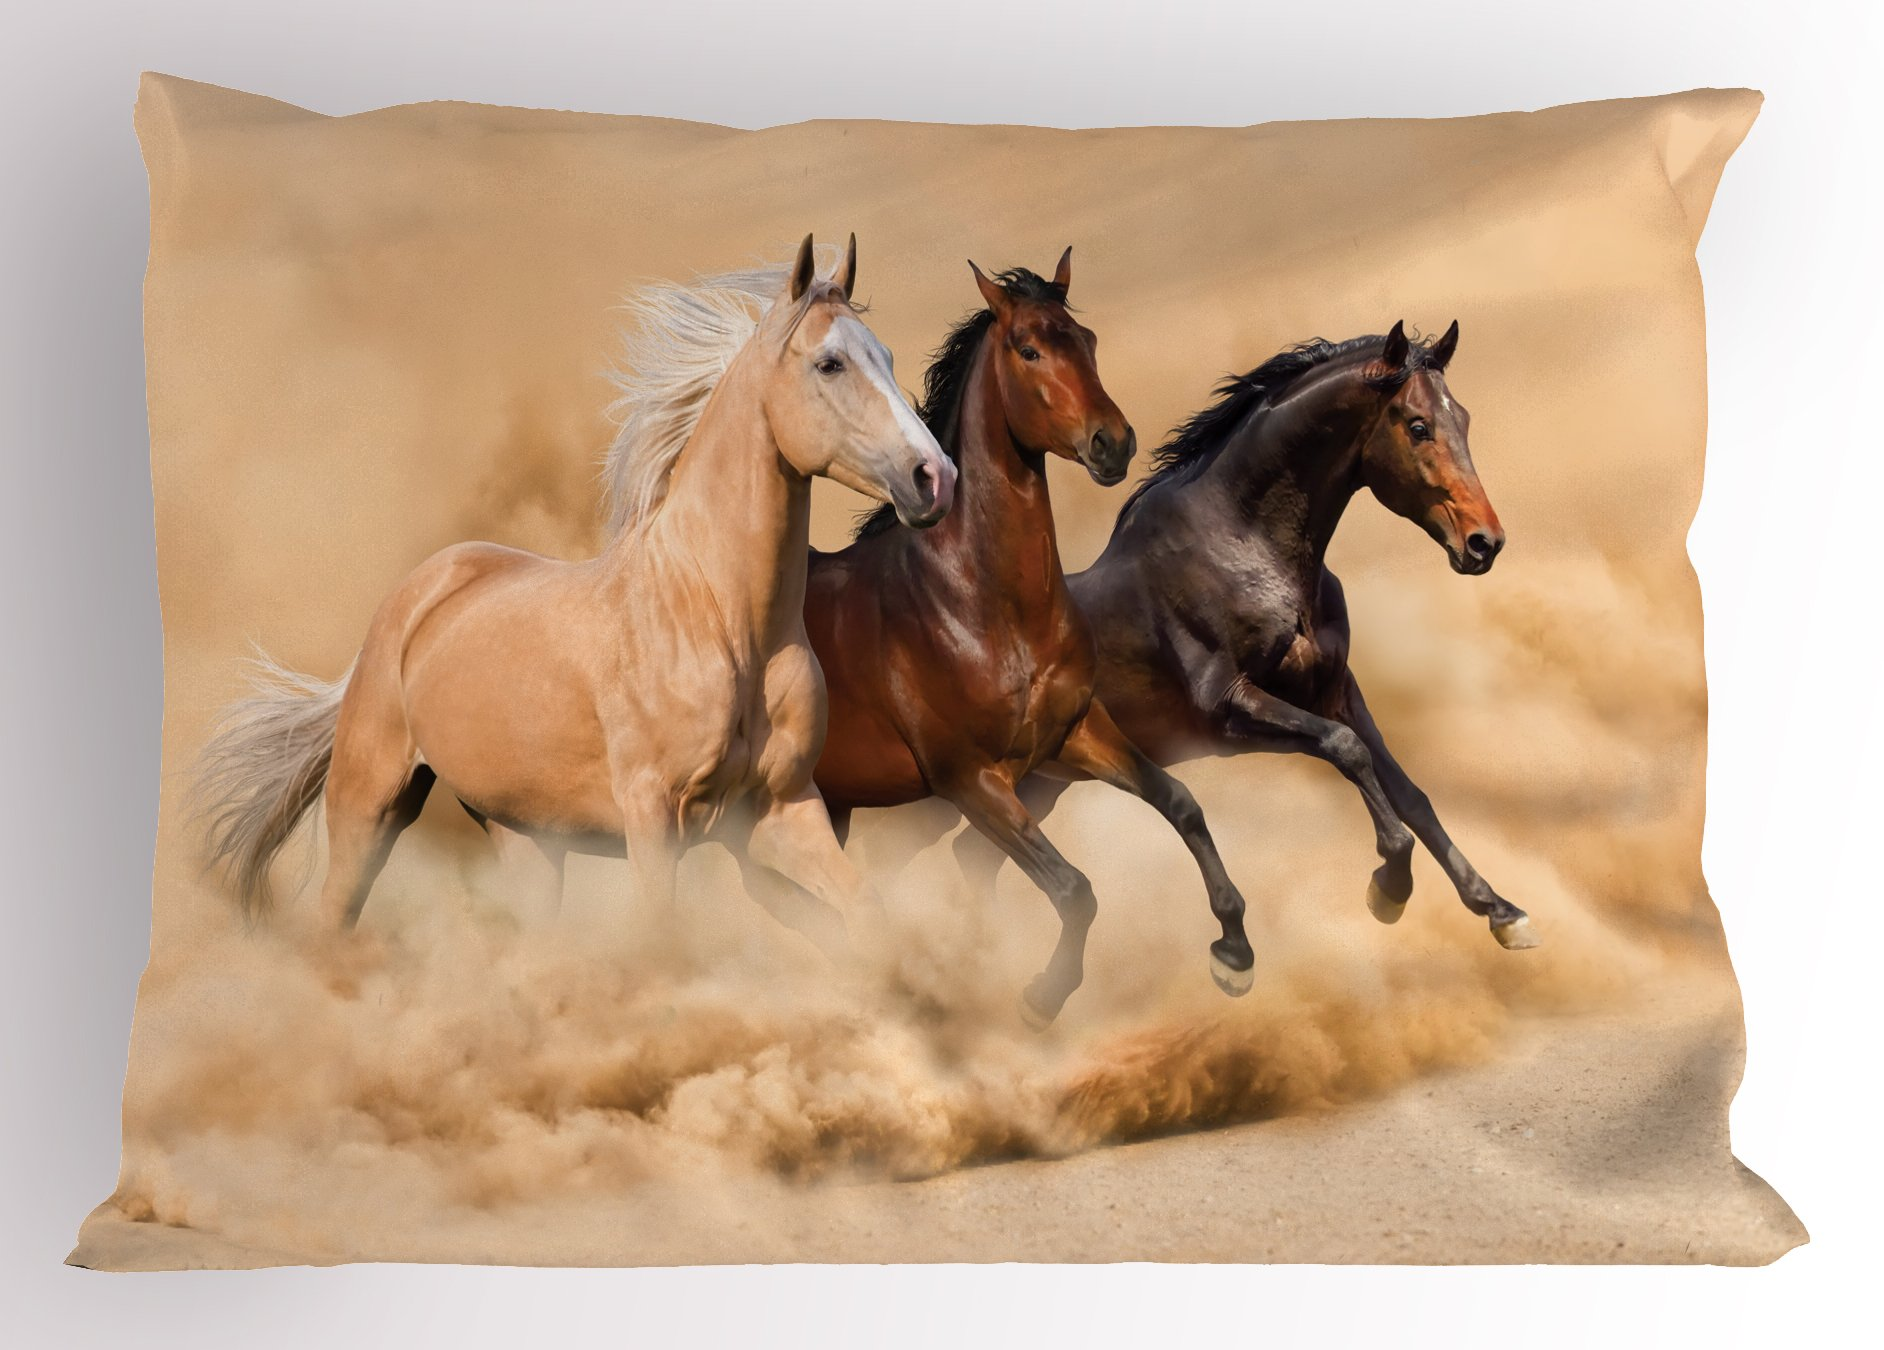 Lunarable Horses Pillow Sham, Three Horse Running in Desert Storm Mythical Mystic Messenger Animals Habitat Print, Decorative Standard Queen Size Printed Pillowcase, 30 X 20 Inches, Cream Brown